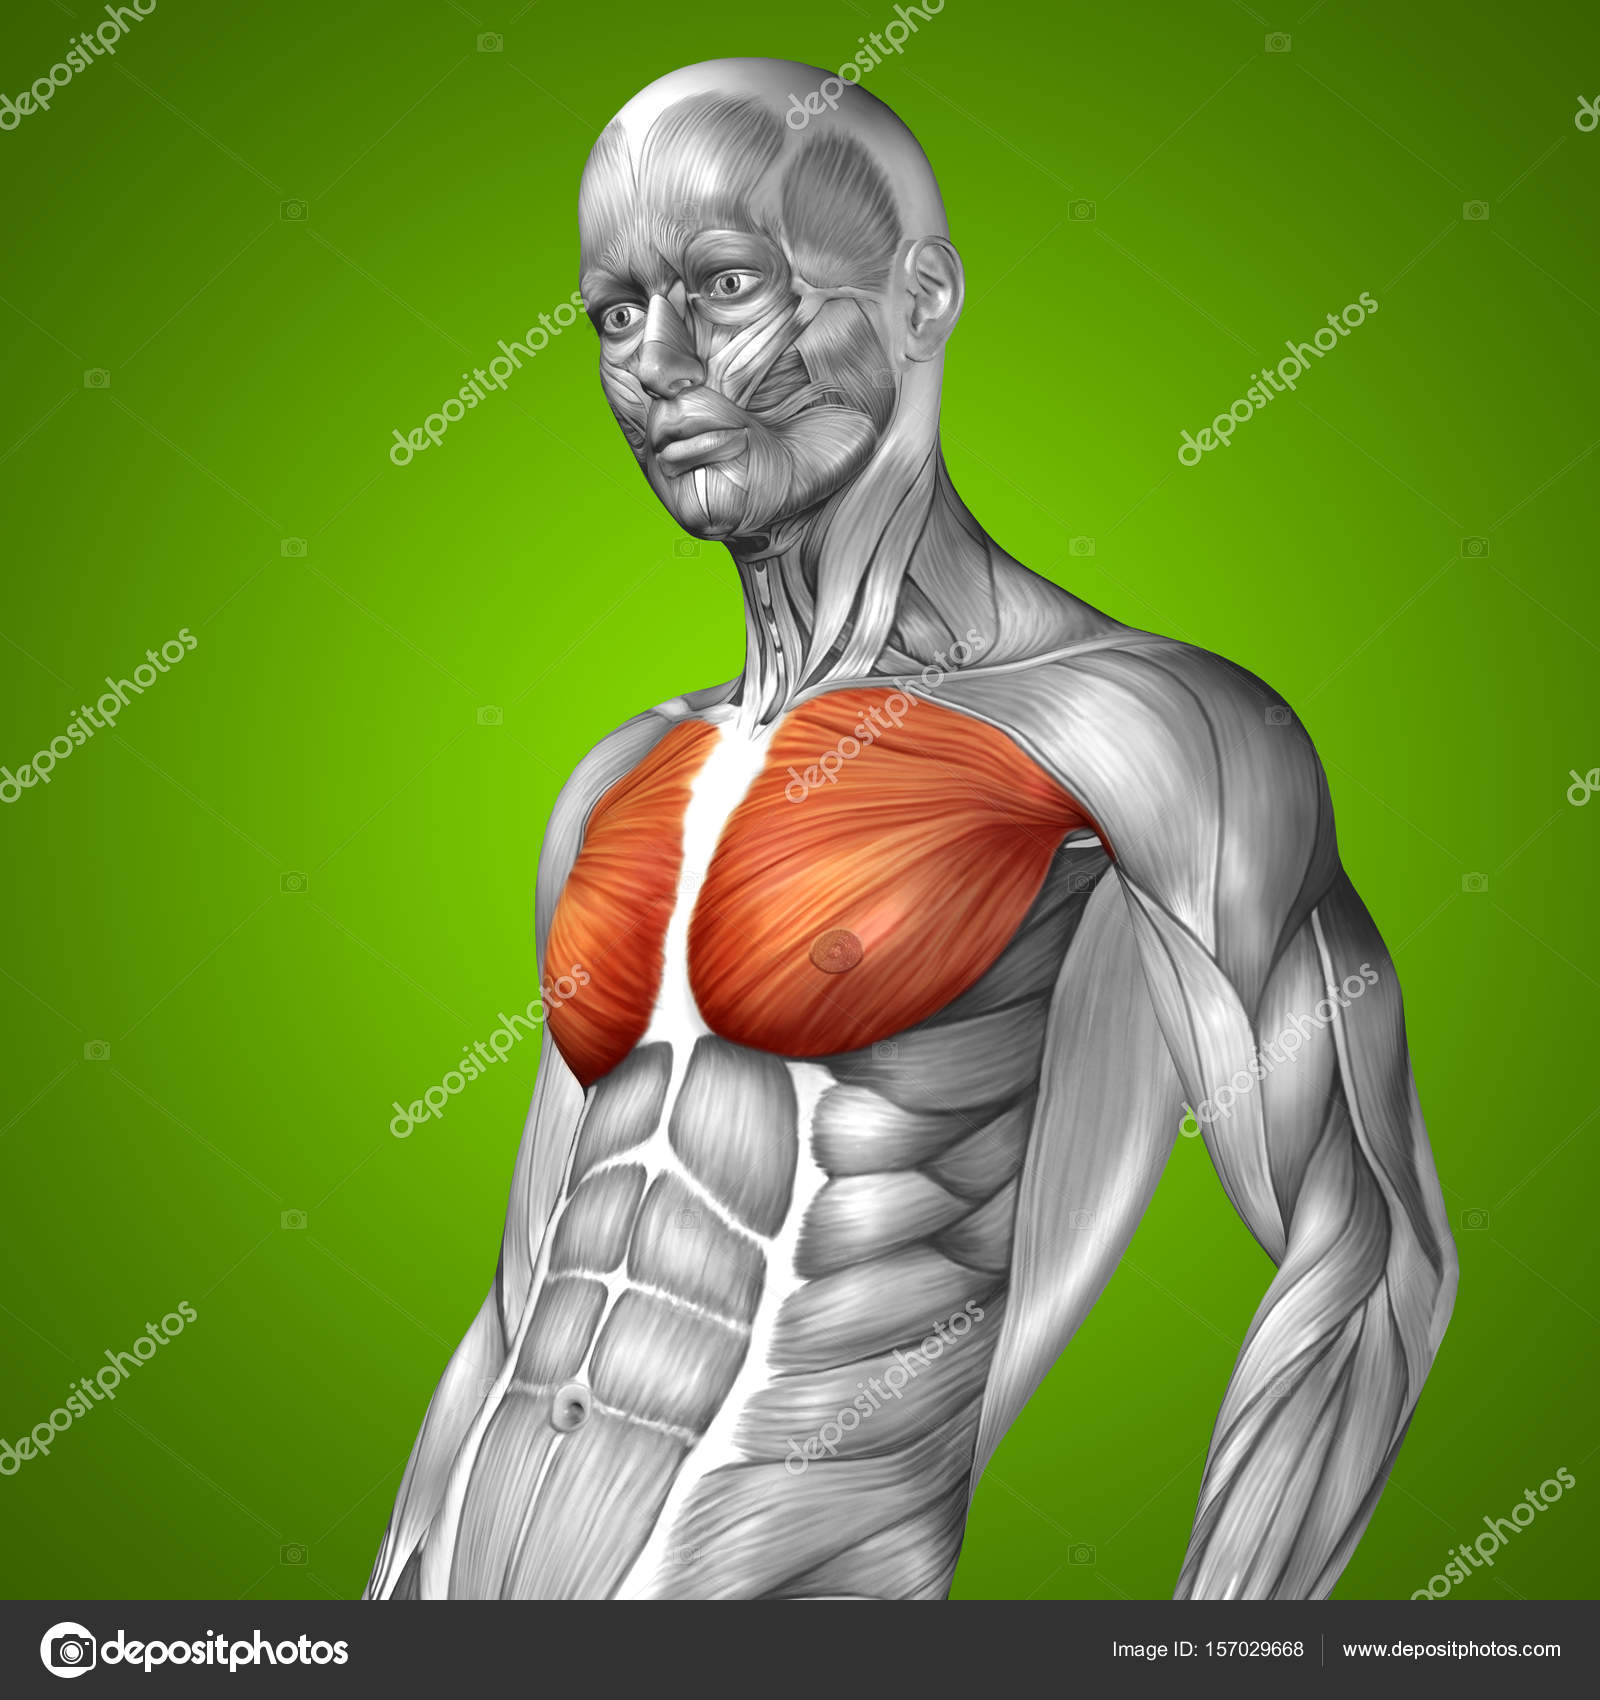 anatomía humana o anatómica — Foto de stock © design36 #157029668